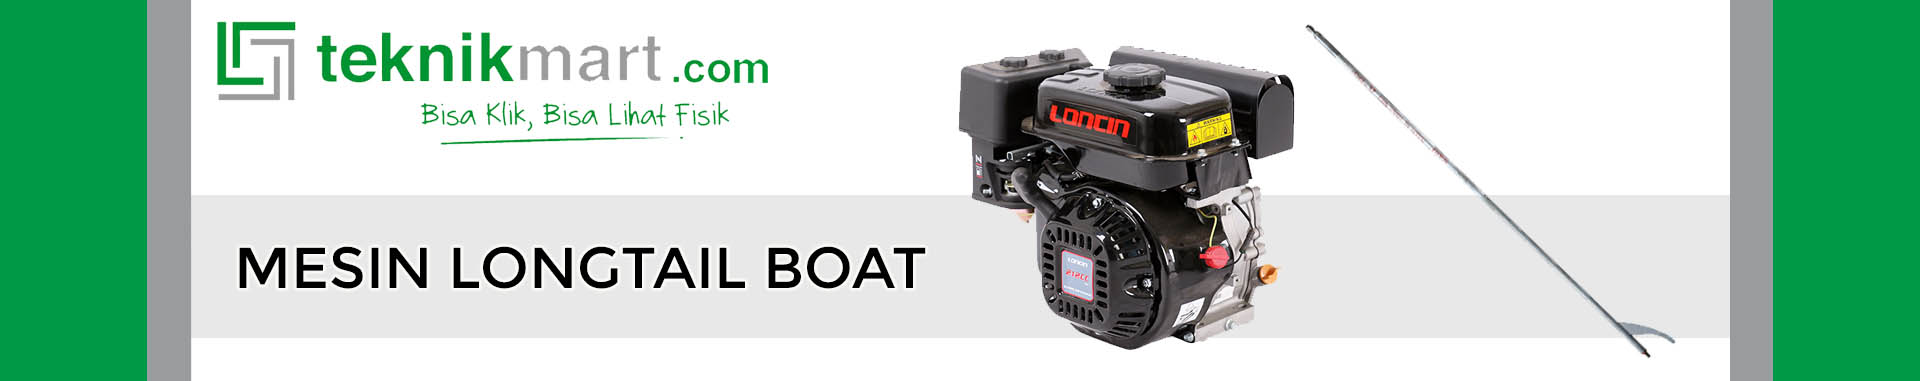 Mesin Longtail Boat